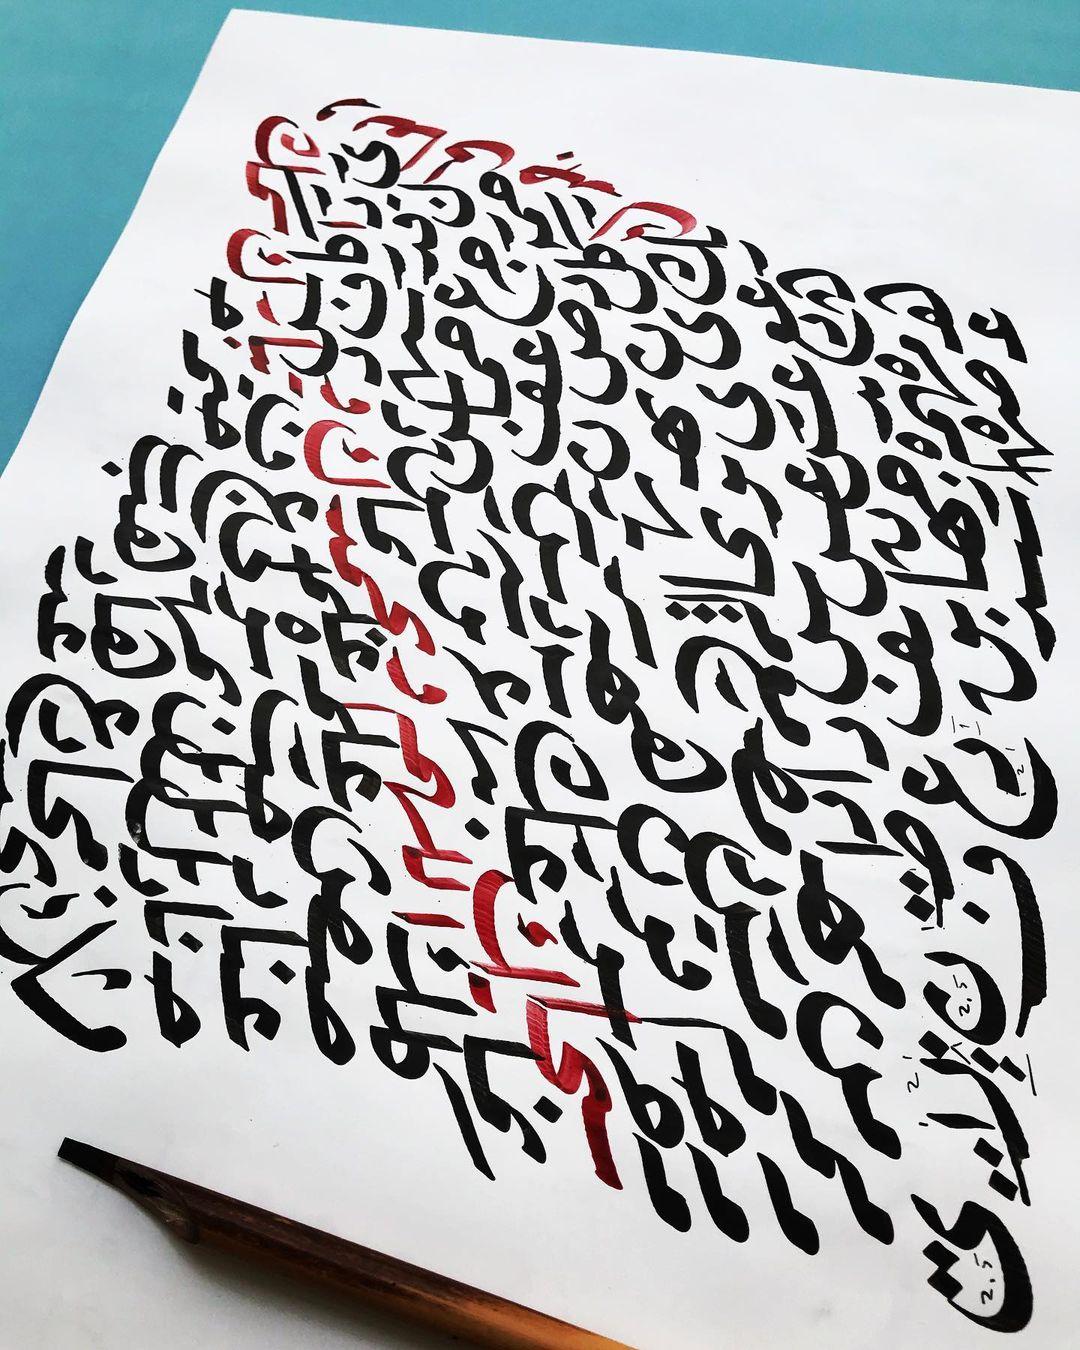 Donwload Photo Mashq #mashq #مشق #exercise #arabiccalligraphy #islamiccalligraphy #tezhip #hüs...- hattat_aa 4